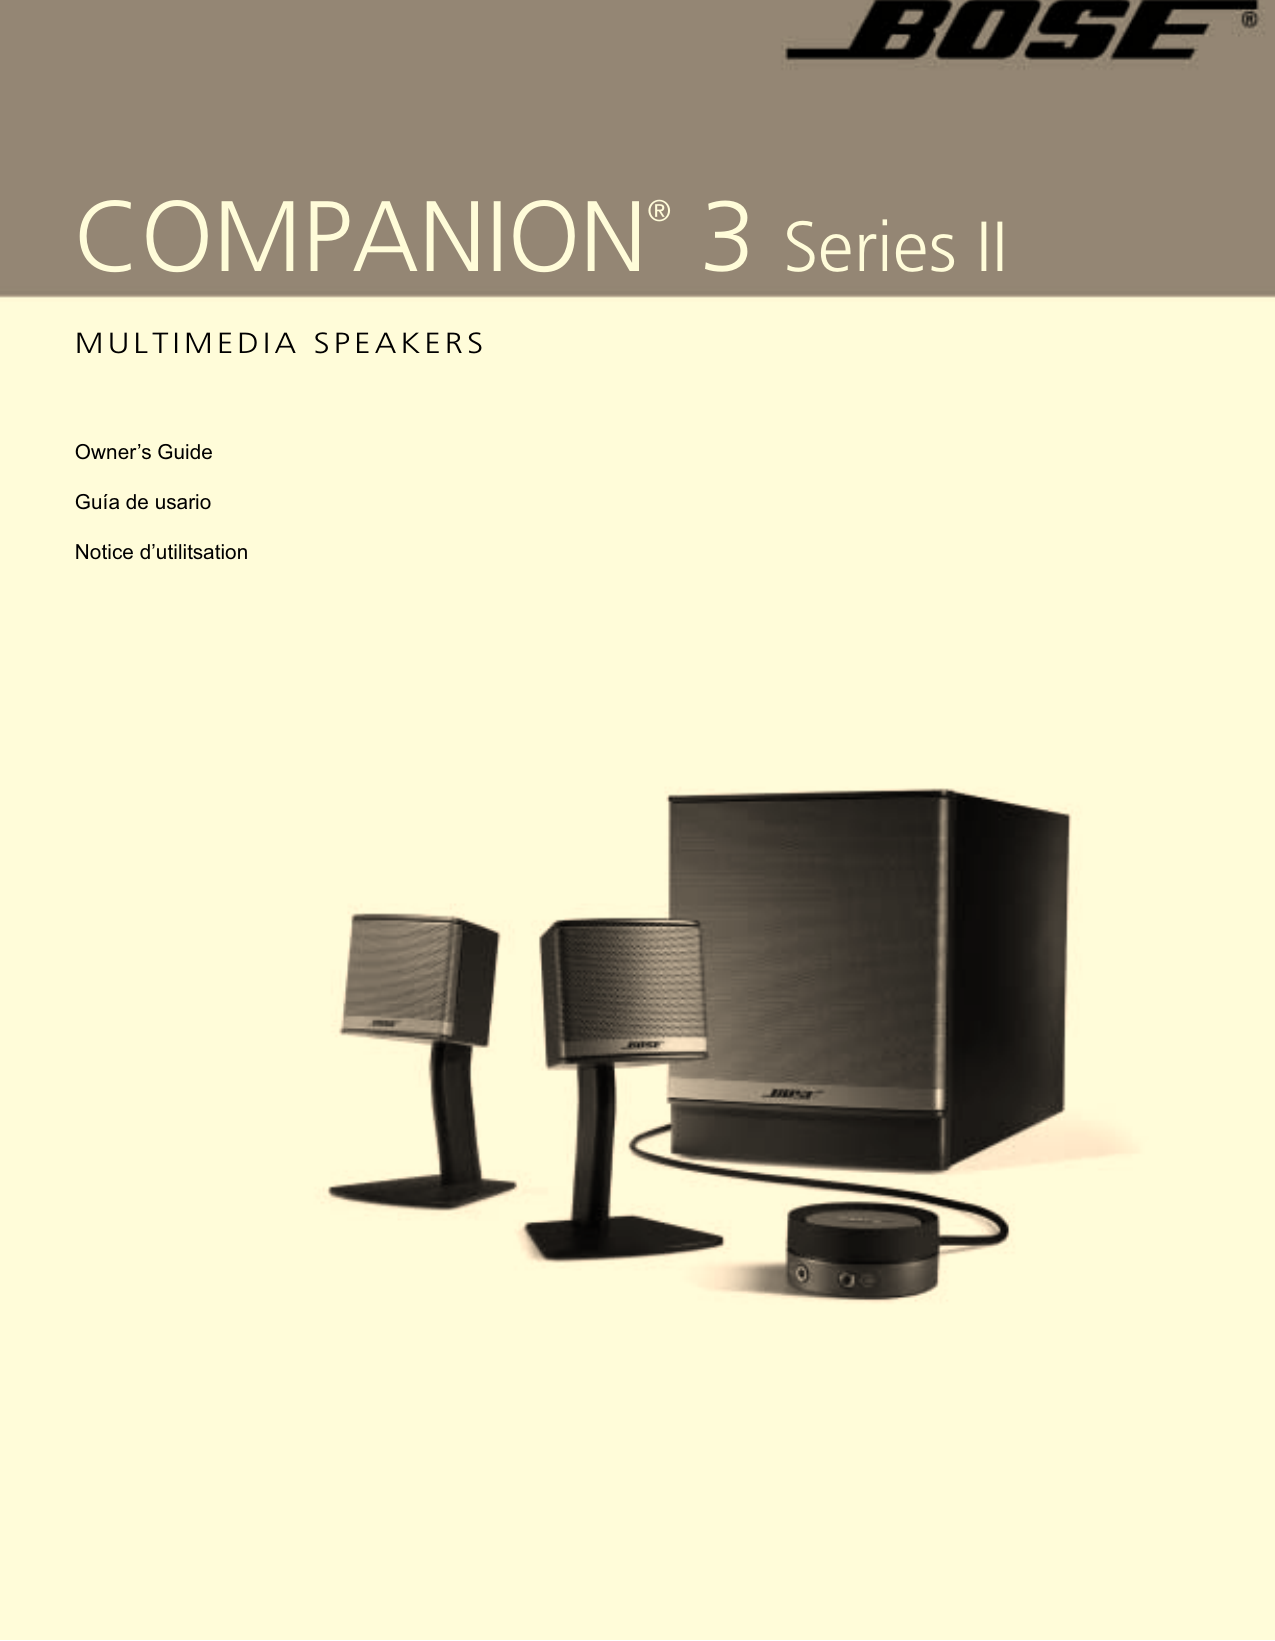 Bose Multimedia Speakers Companion 3 Series Ii Users